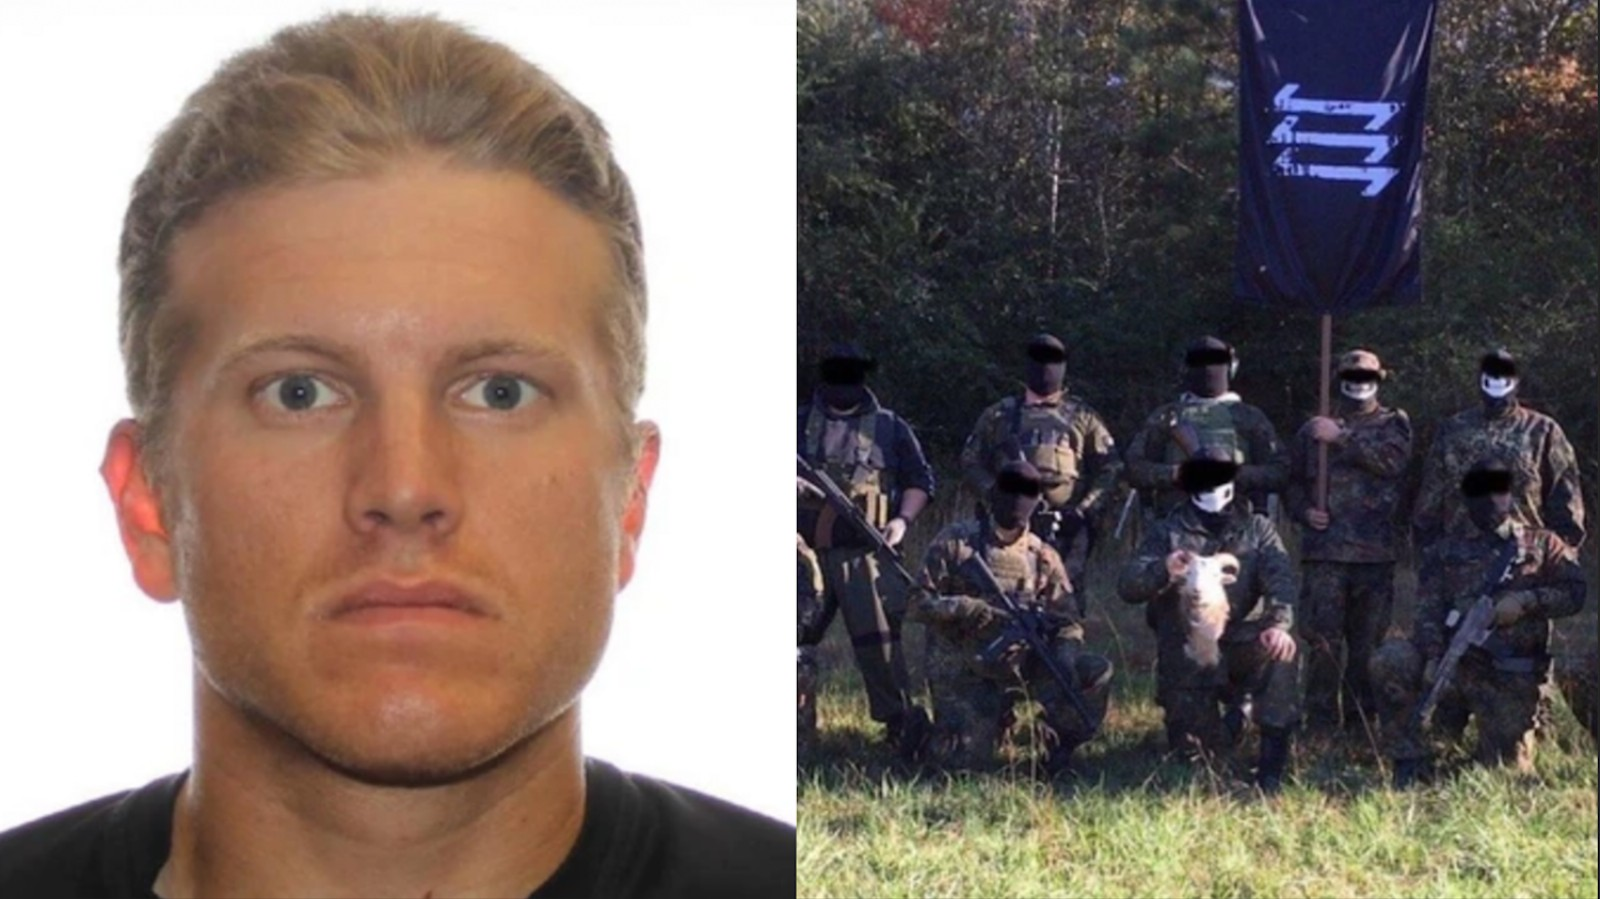 Canada paramilitary Nazi fascism militia white supremacy guns